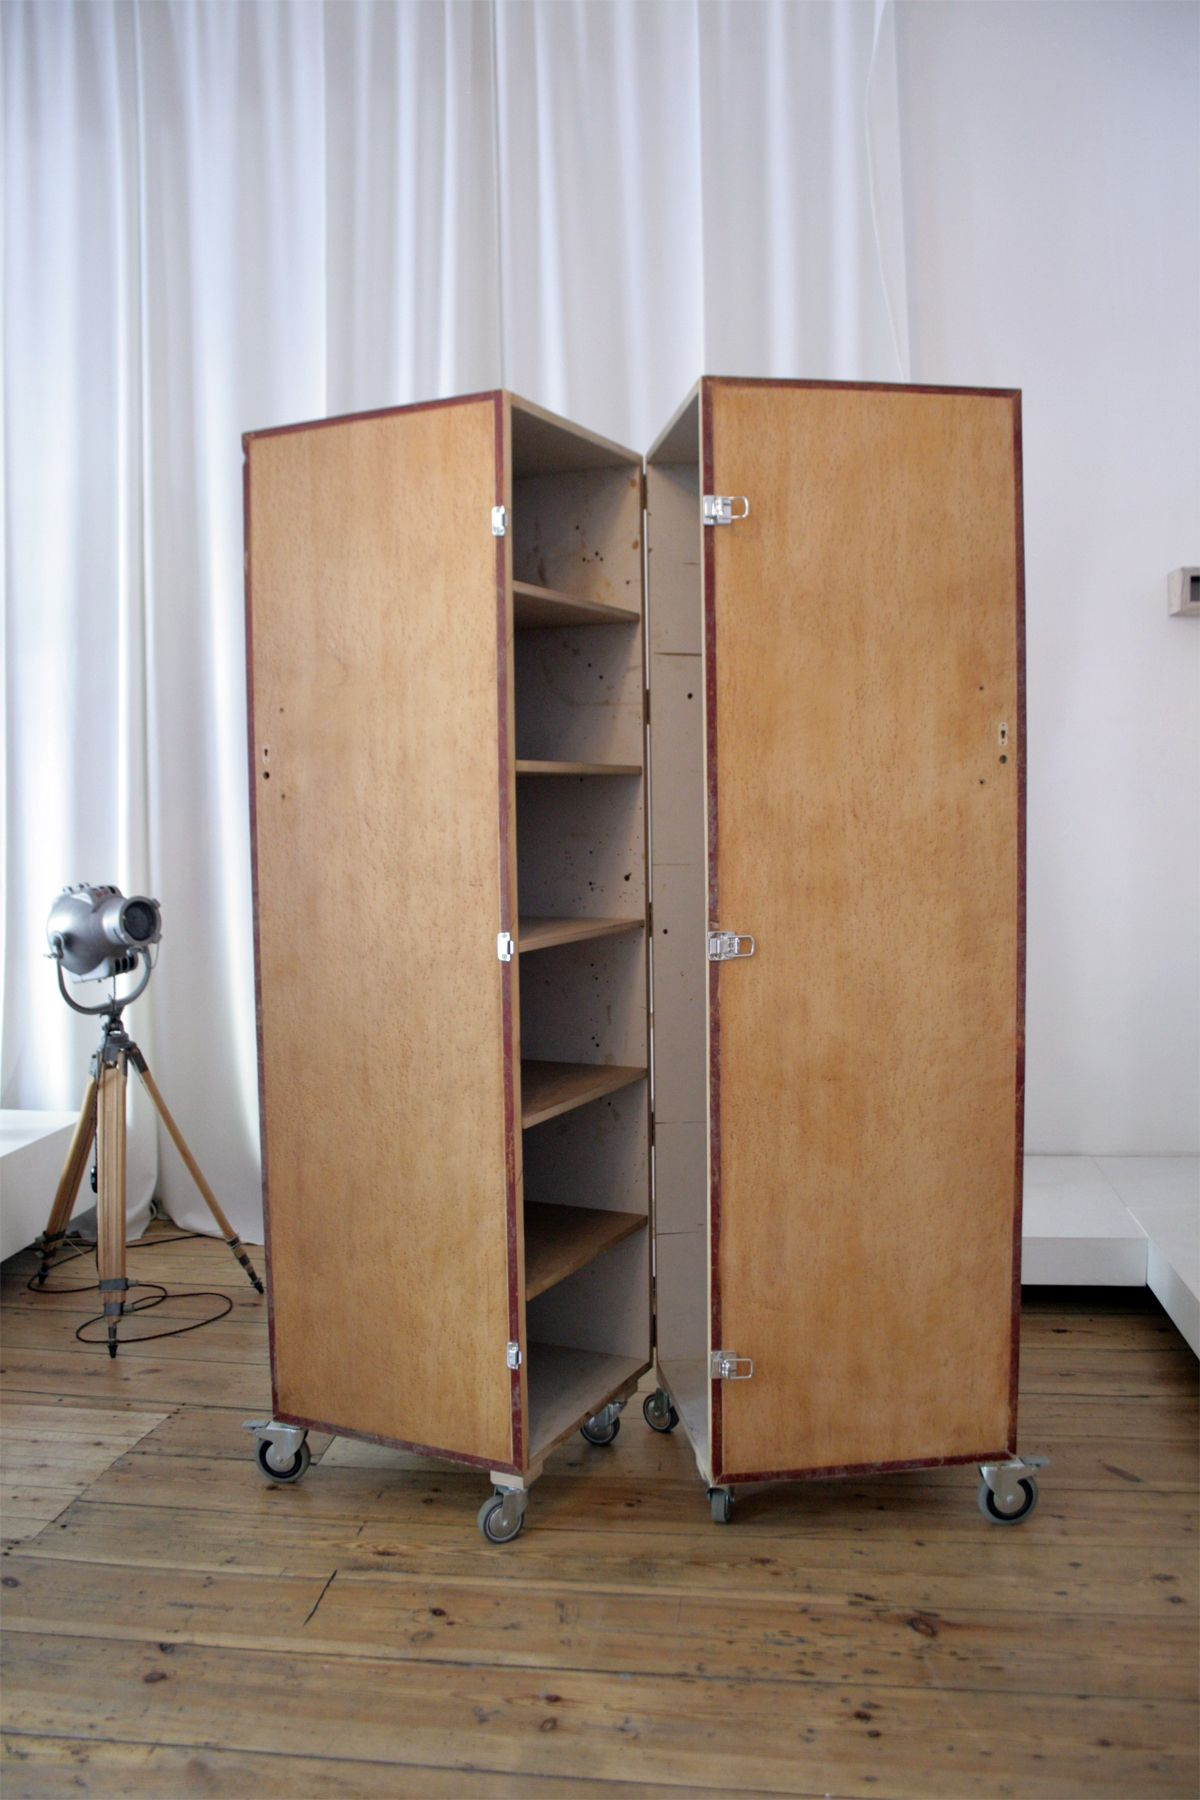 Flight case wardrobe, Rollers, Portable | DIY | Pinterest | Wardrobes, Steamer trunk and Storage